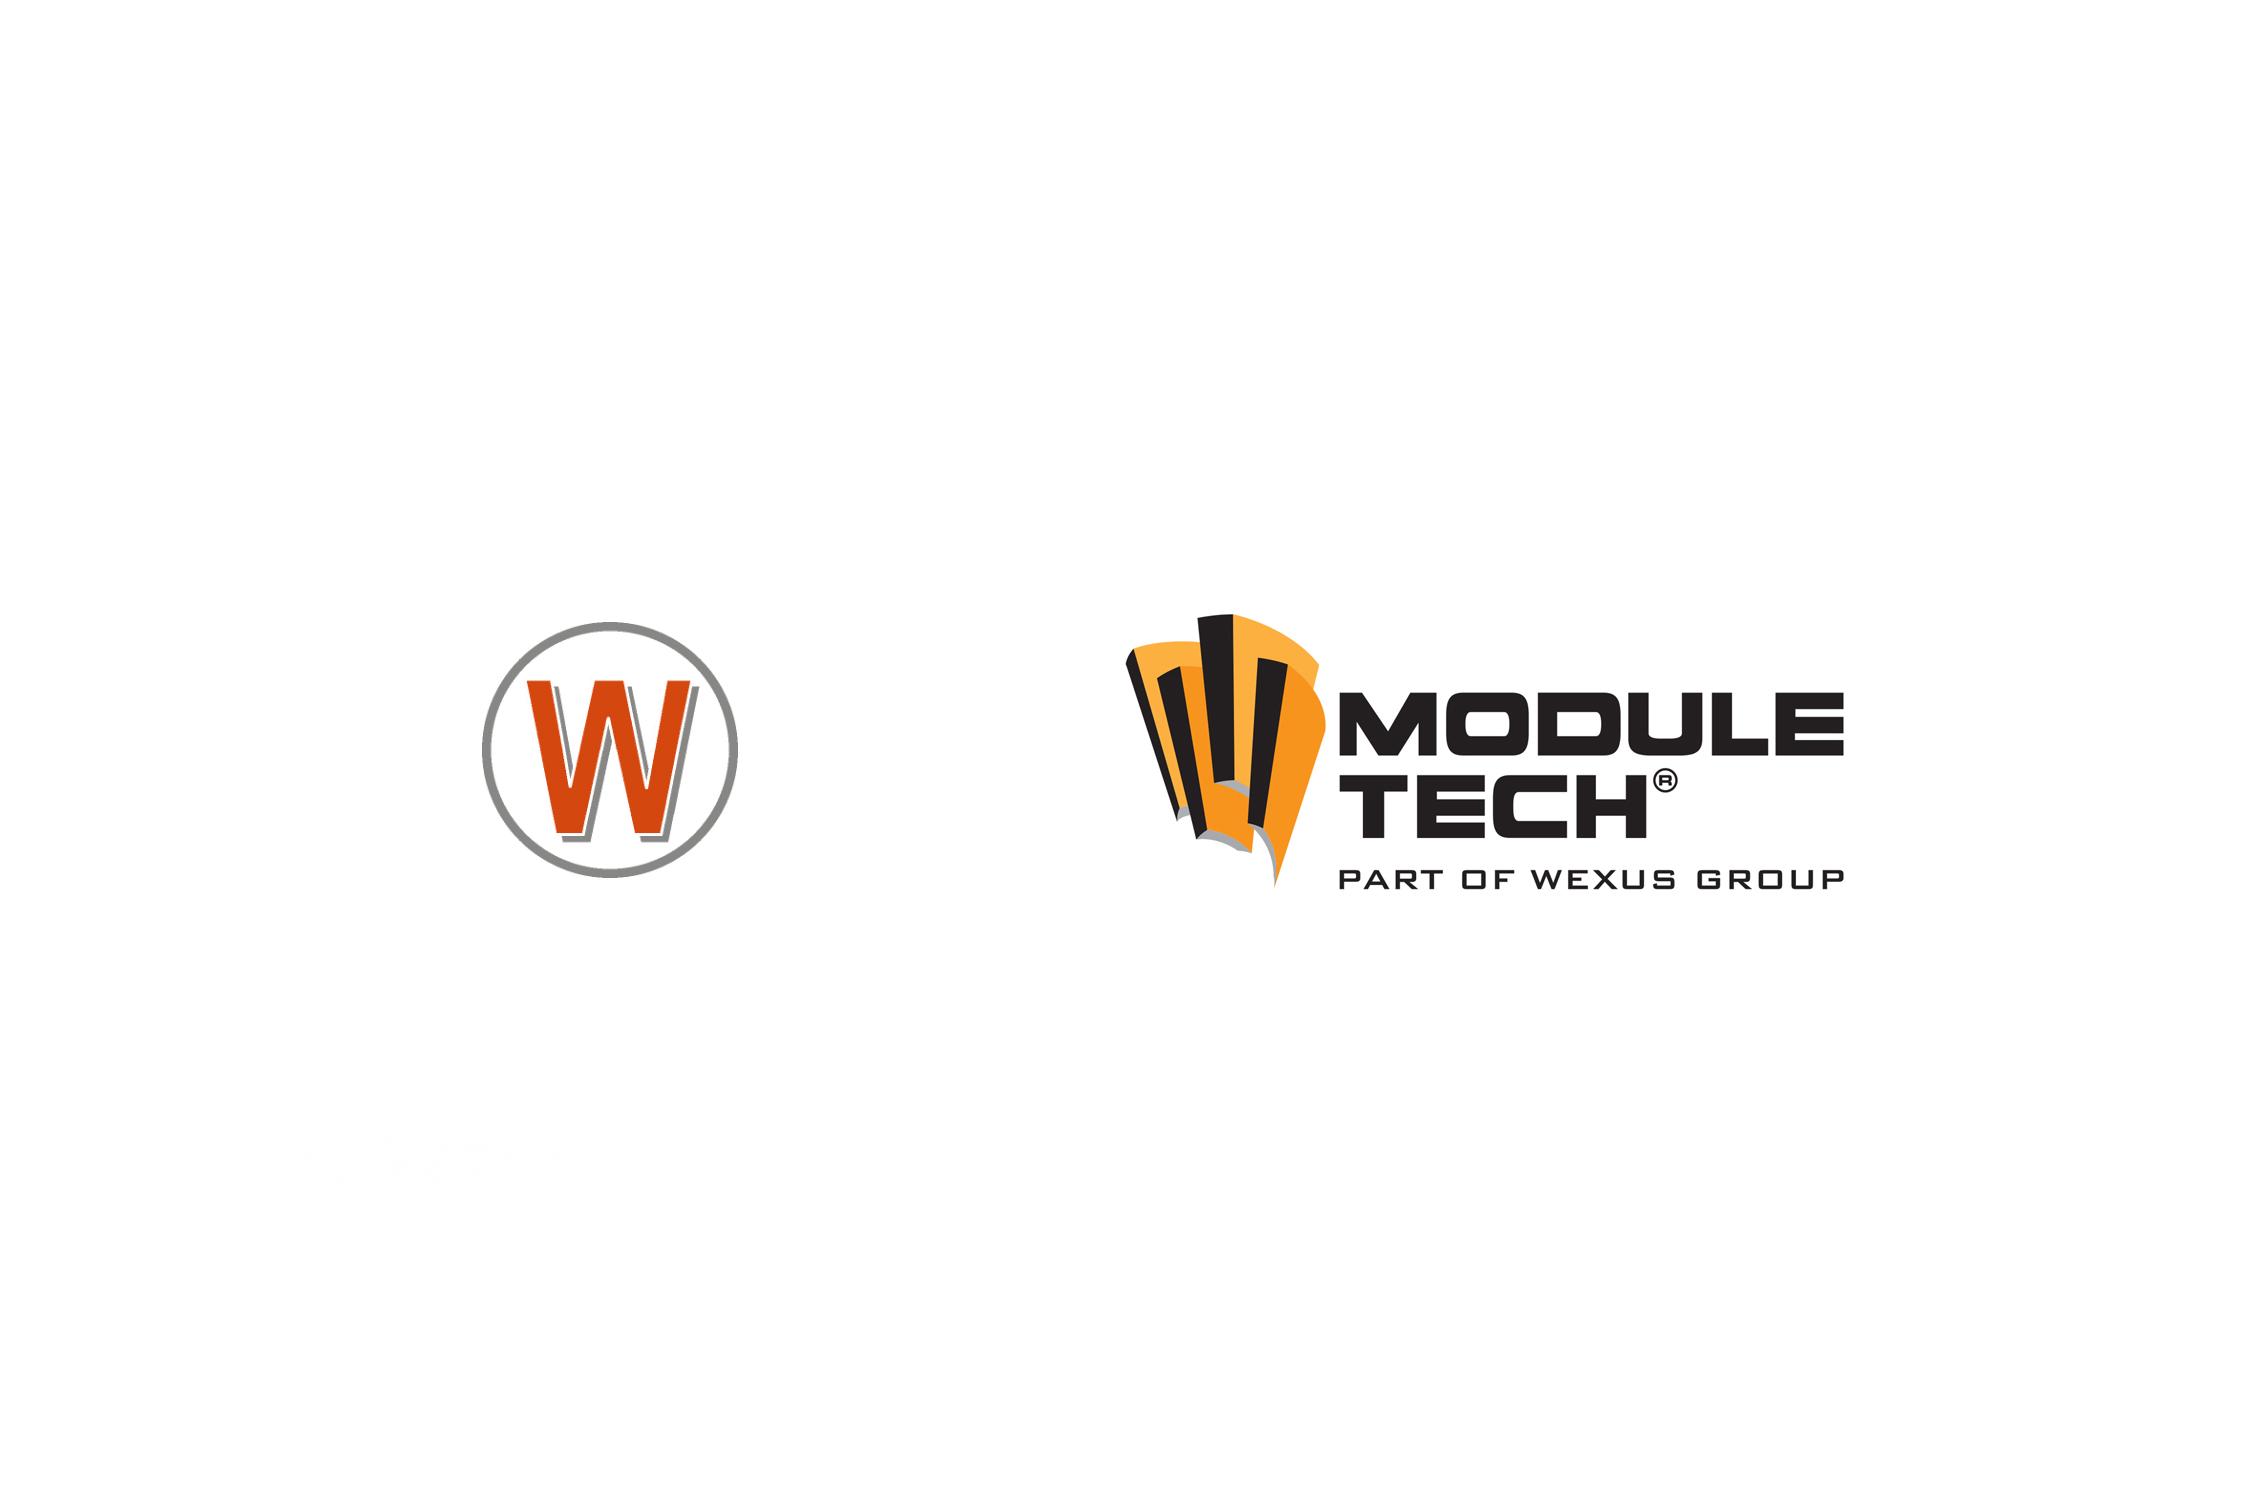 MD logo copy